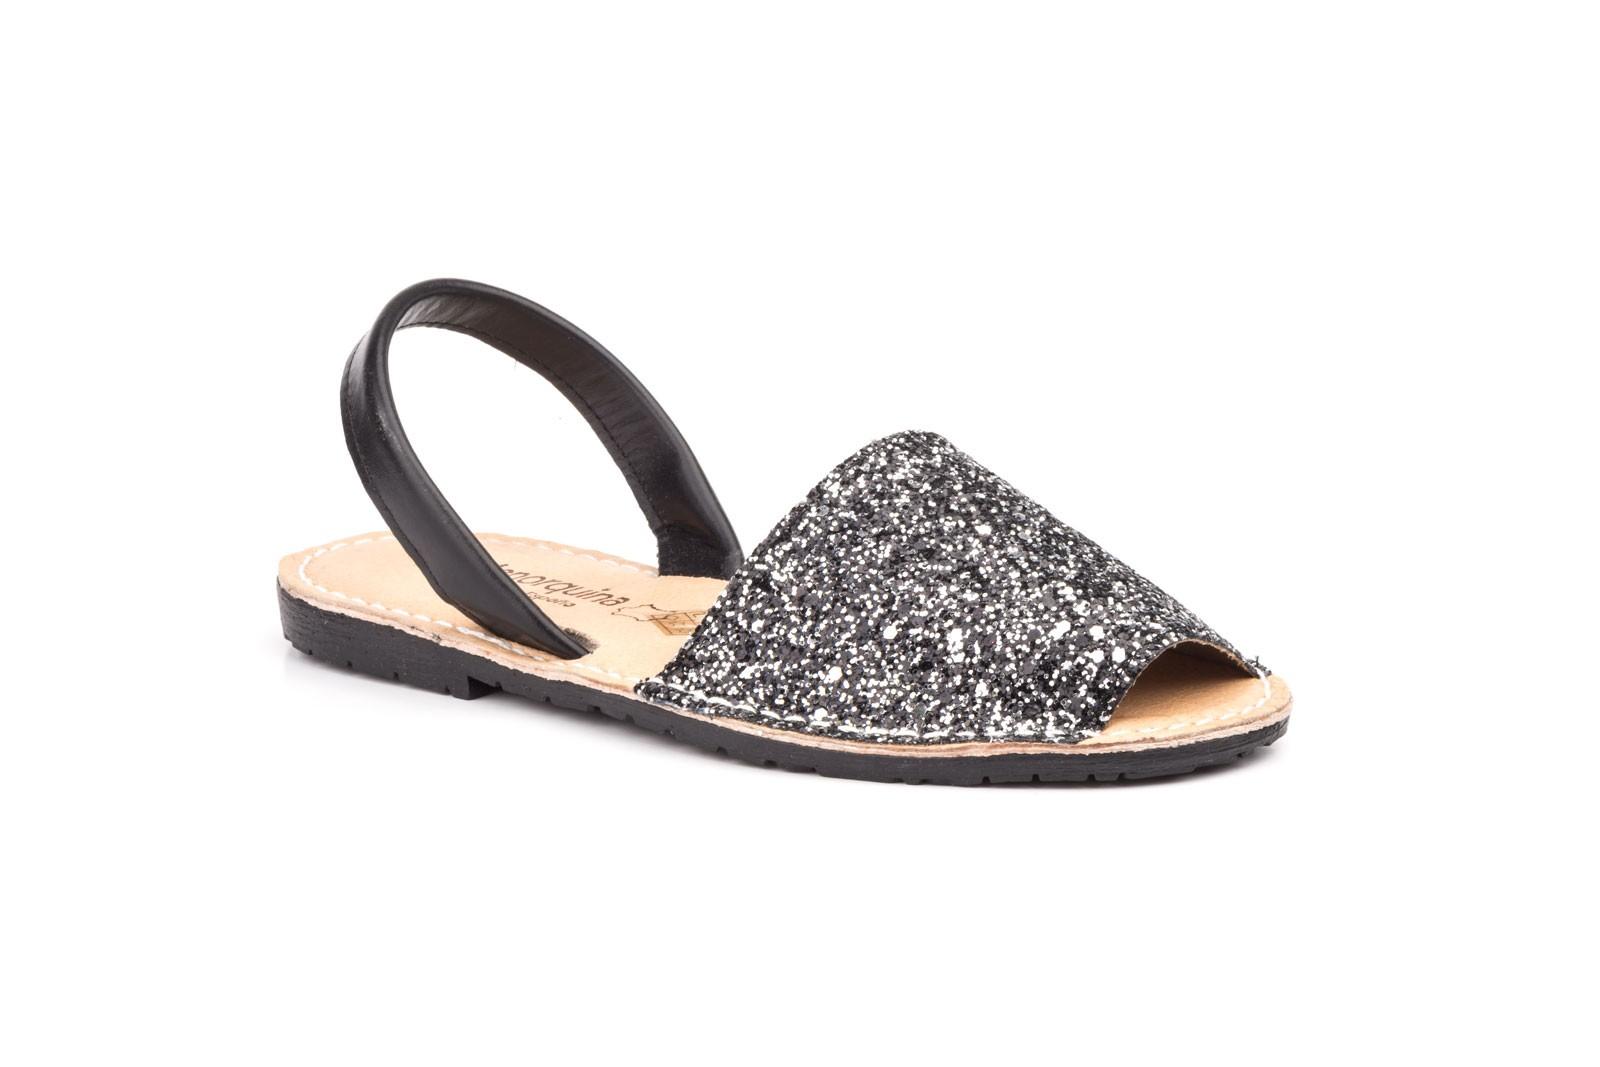 Avarcas Menorquinas Mujer Glitter Multi Plata Marino Negro Acolchada MENORQUINAS-670024,90€